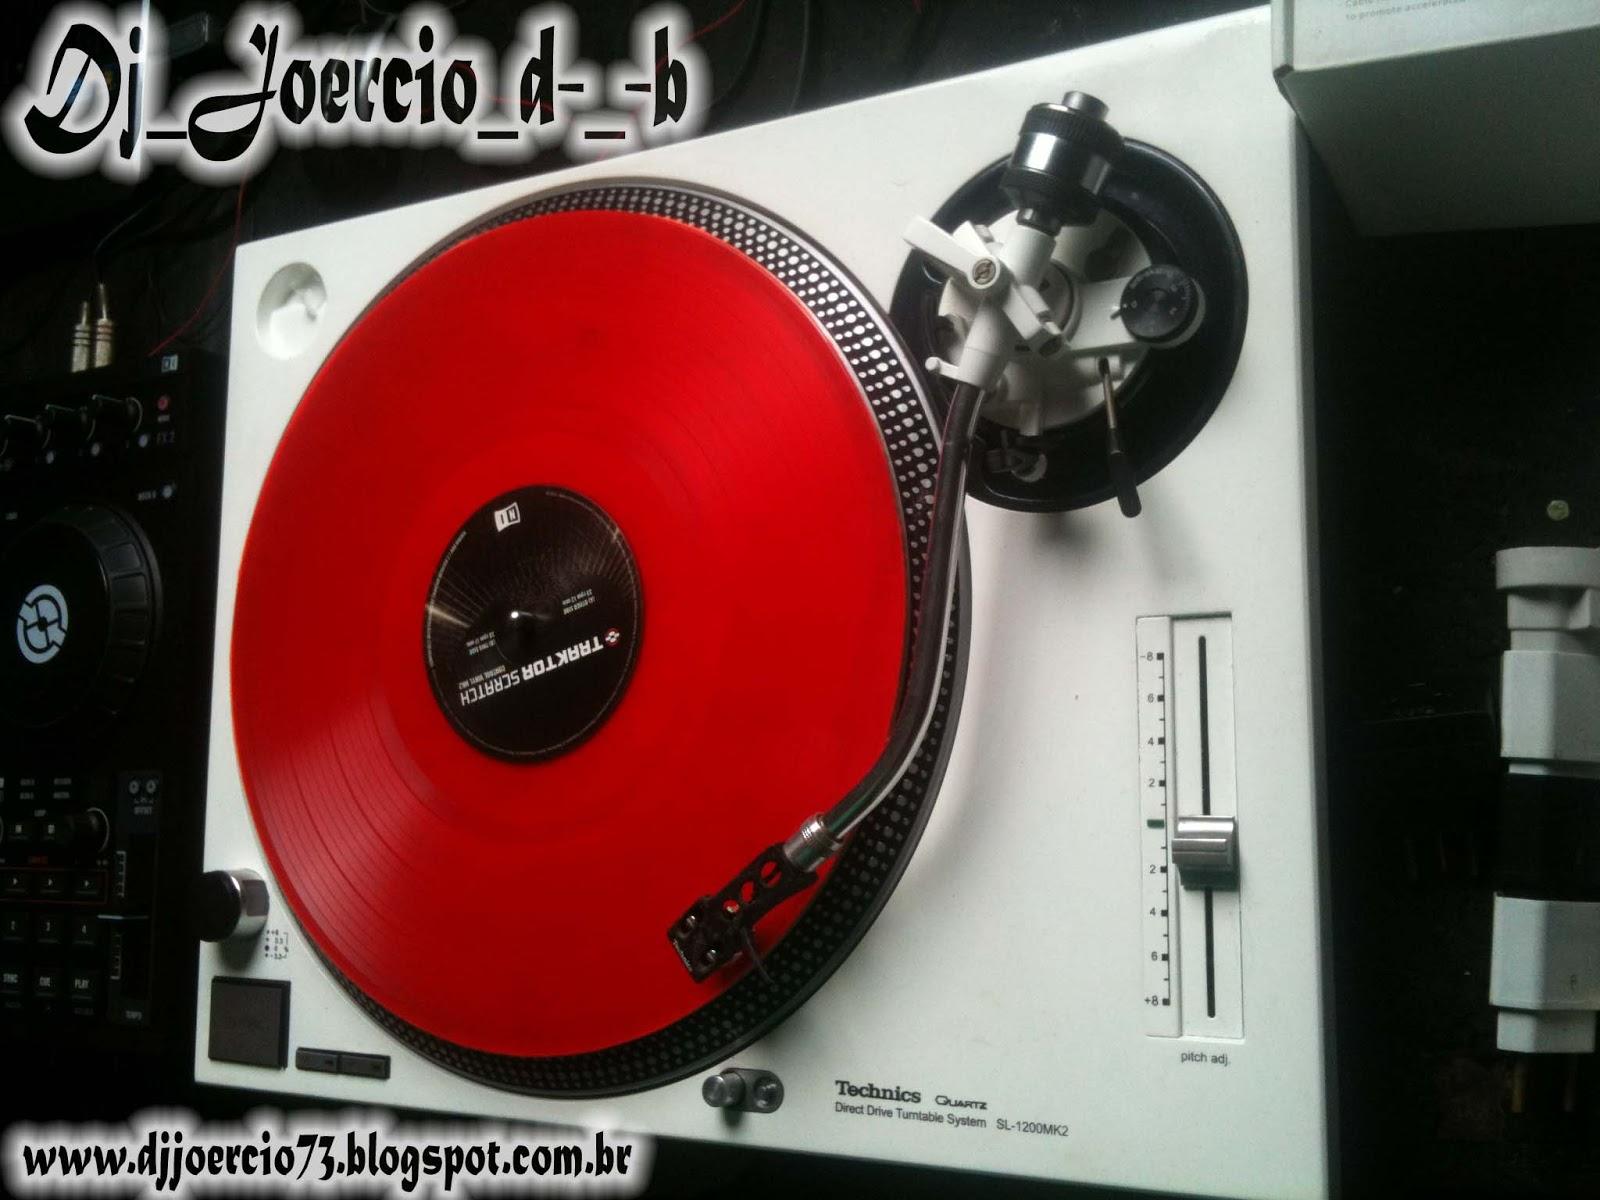 http://3.bp.blogspot.com/-jaOsA6XKQpQ/UIazjDcLzQI/AAAAAAAAAdY/OZ68EhdgZJU/s1600/Dj+Joercio+Set+Mix.jpg